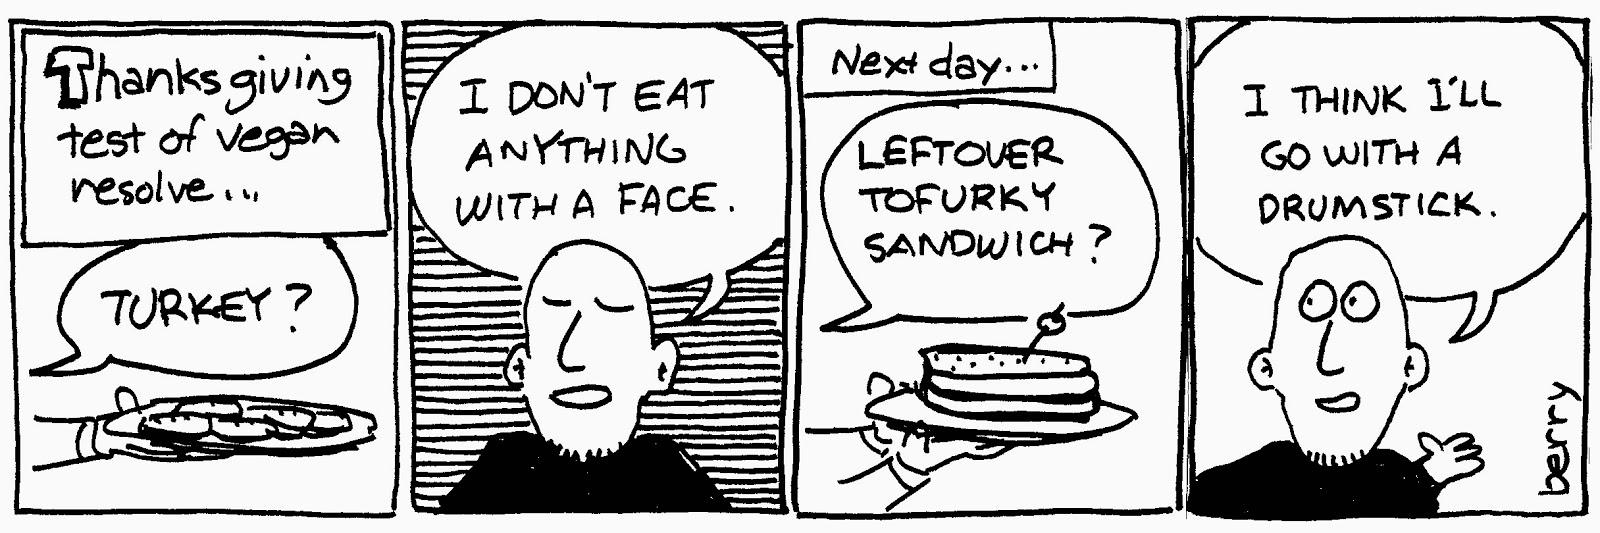 Vegan Thanksgiving Cartoon